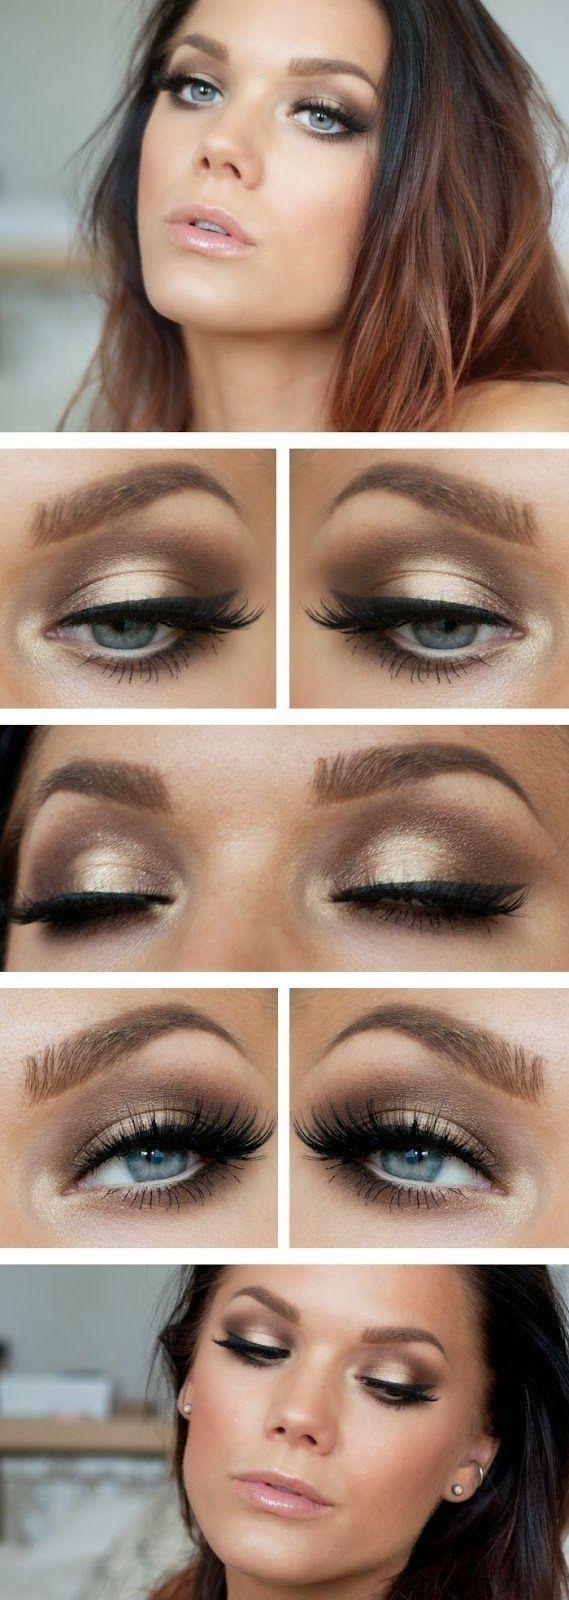 Bronze Wedding Makeup Best Photos Page 3 Of 4 Wedding Makeup And